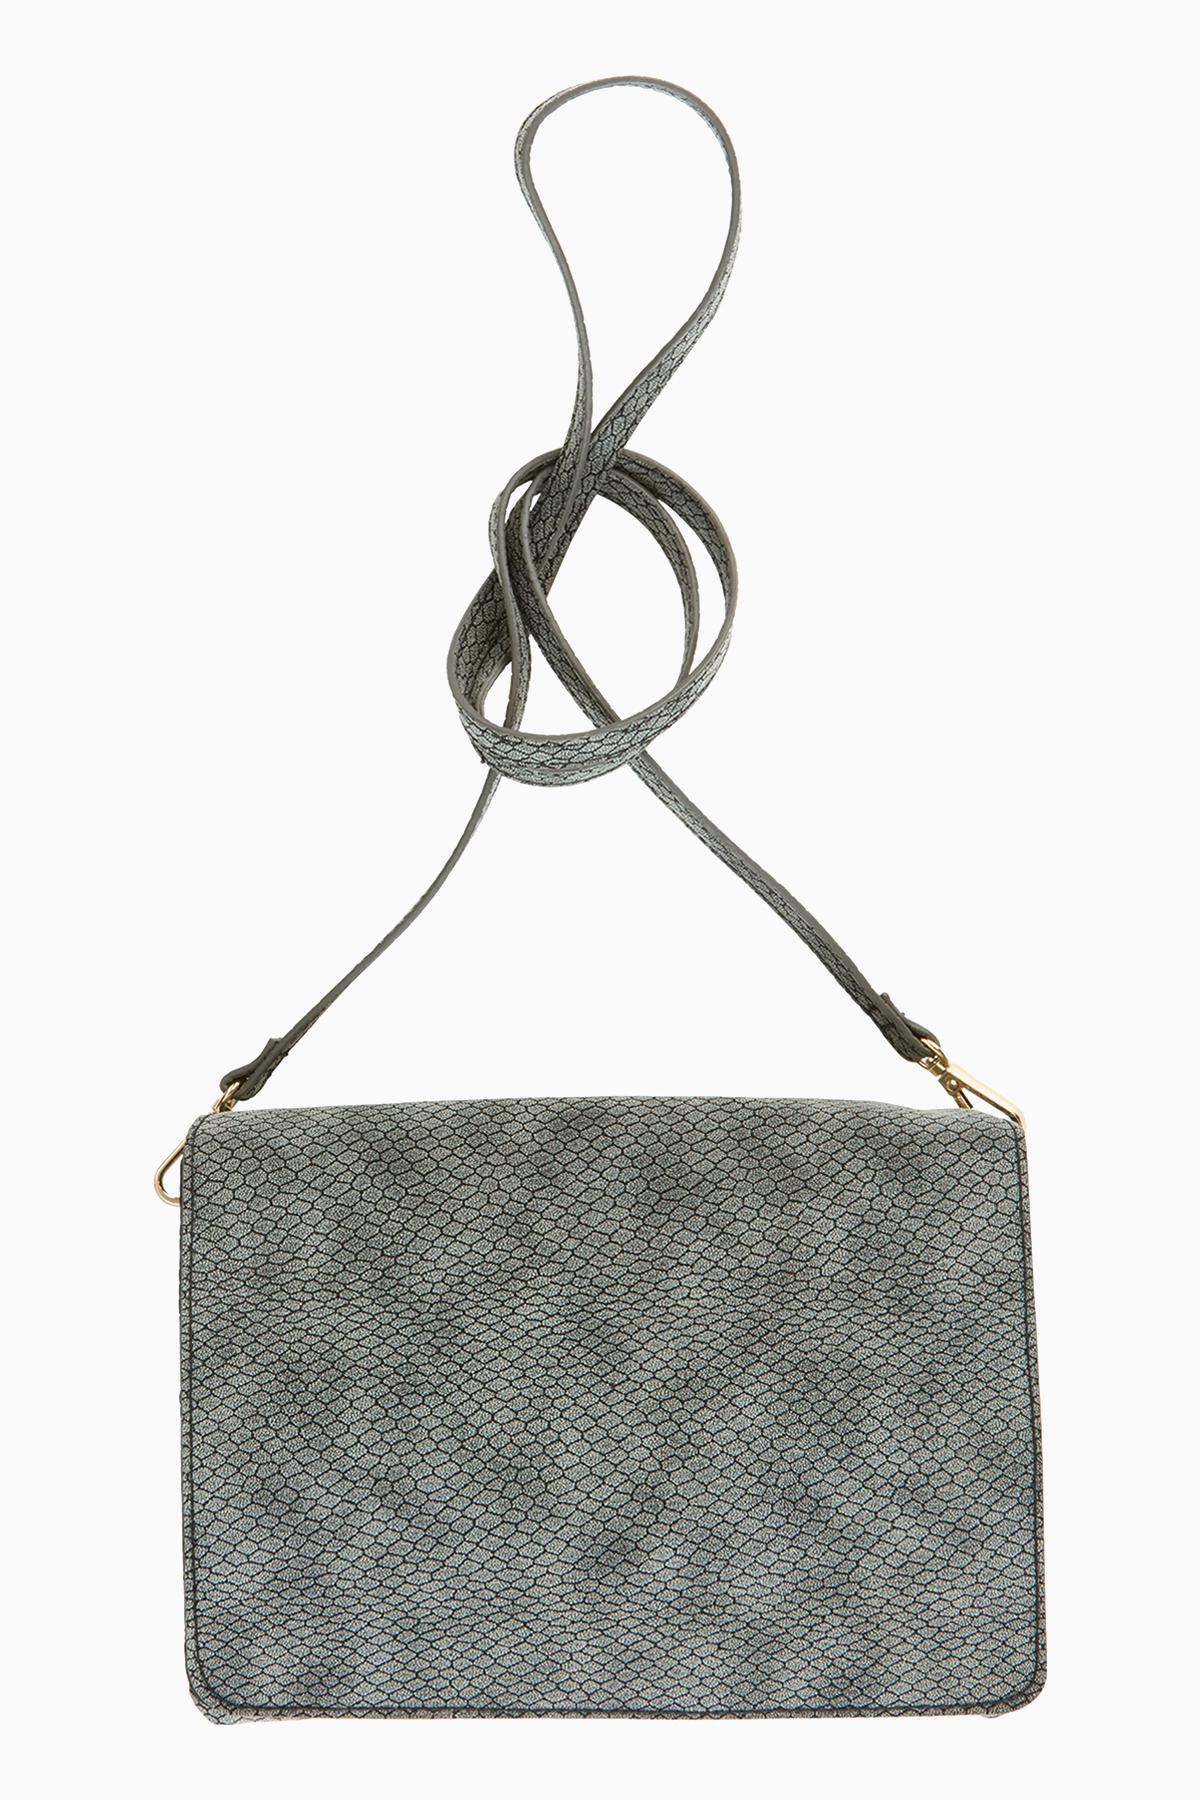 Image of   Ichi - accessories Dame Fin London taske - Grå